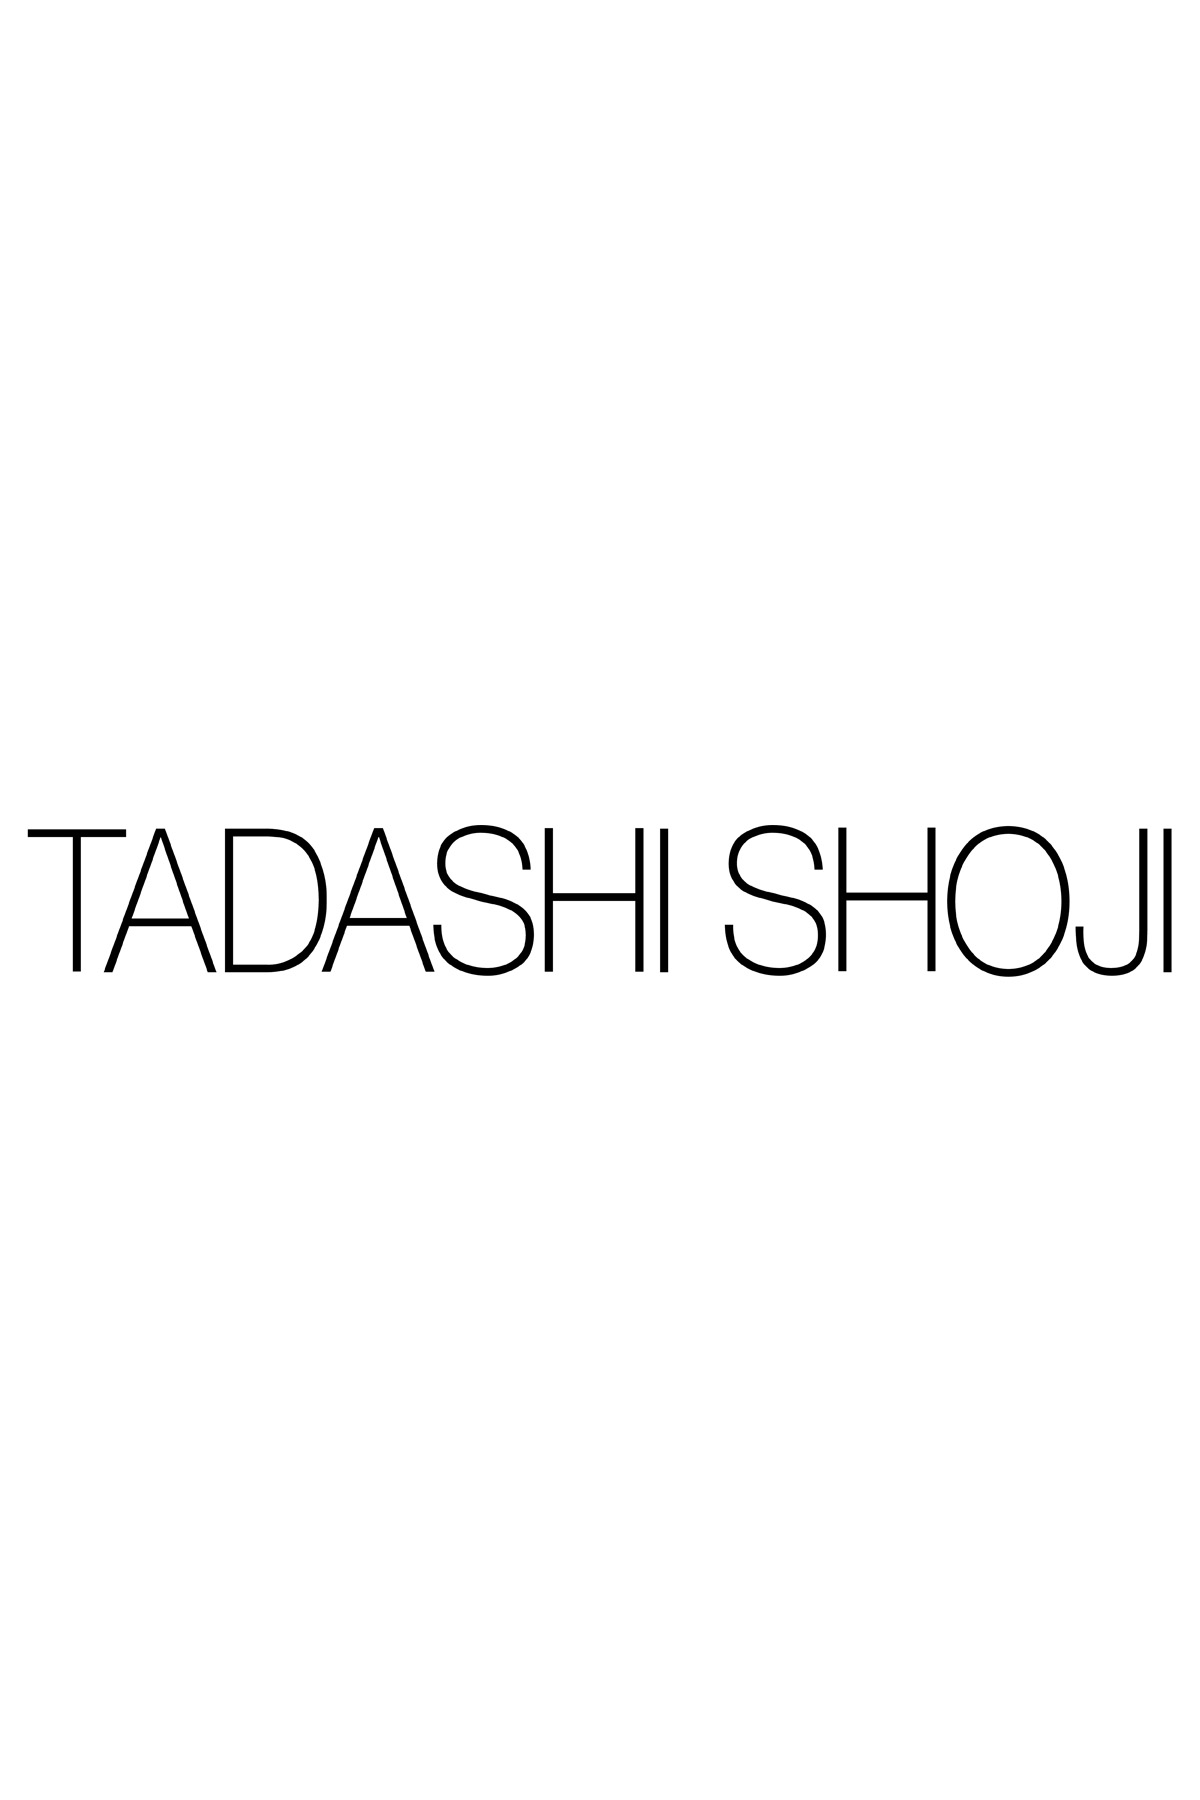 Tadashi Shoji - Corded Embroidery on Tulle A-Line Dress - Detail